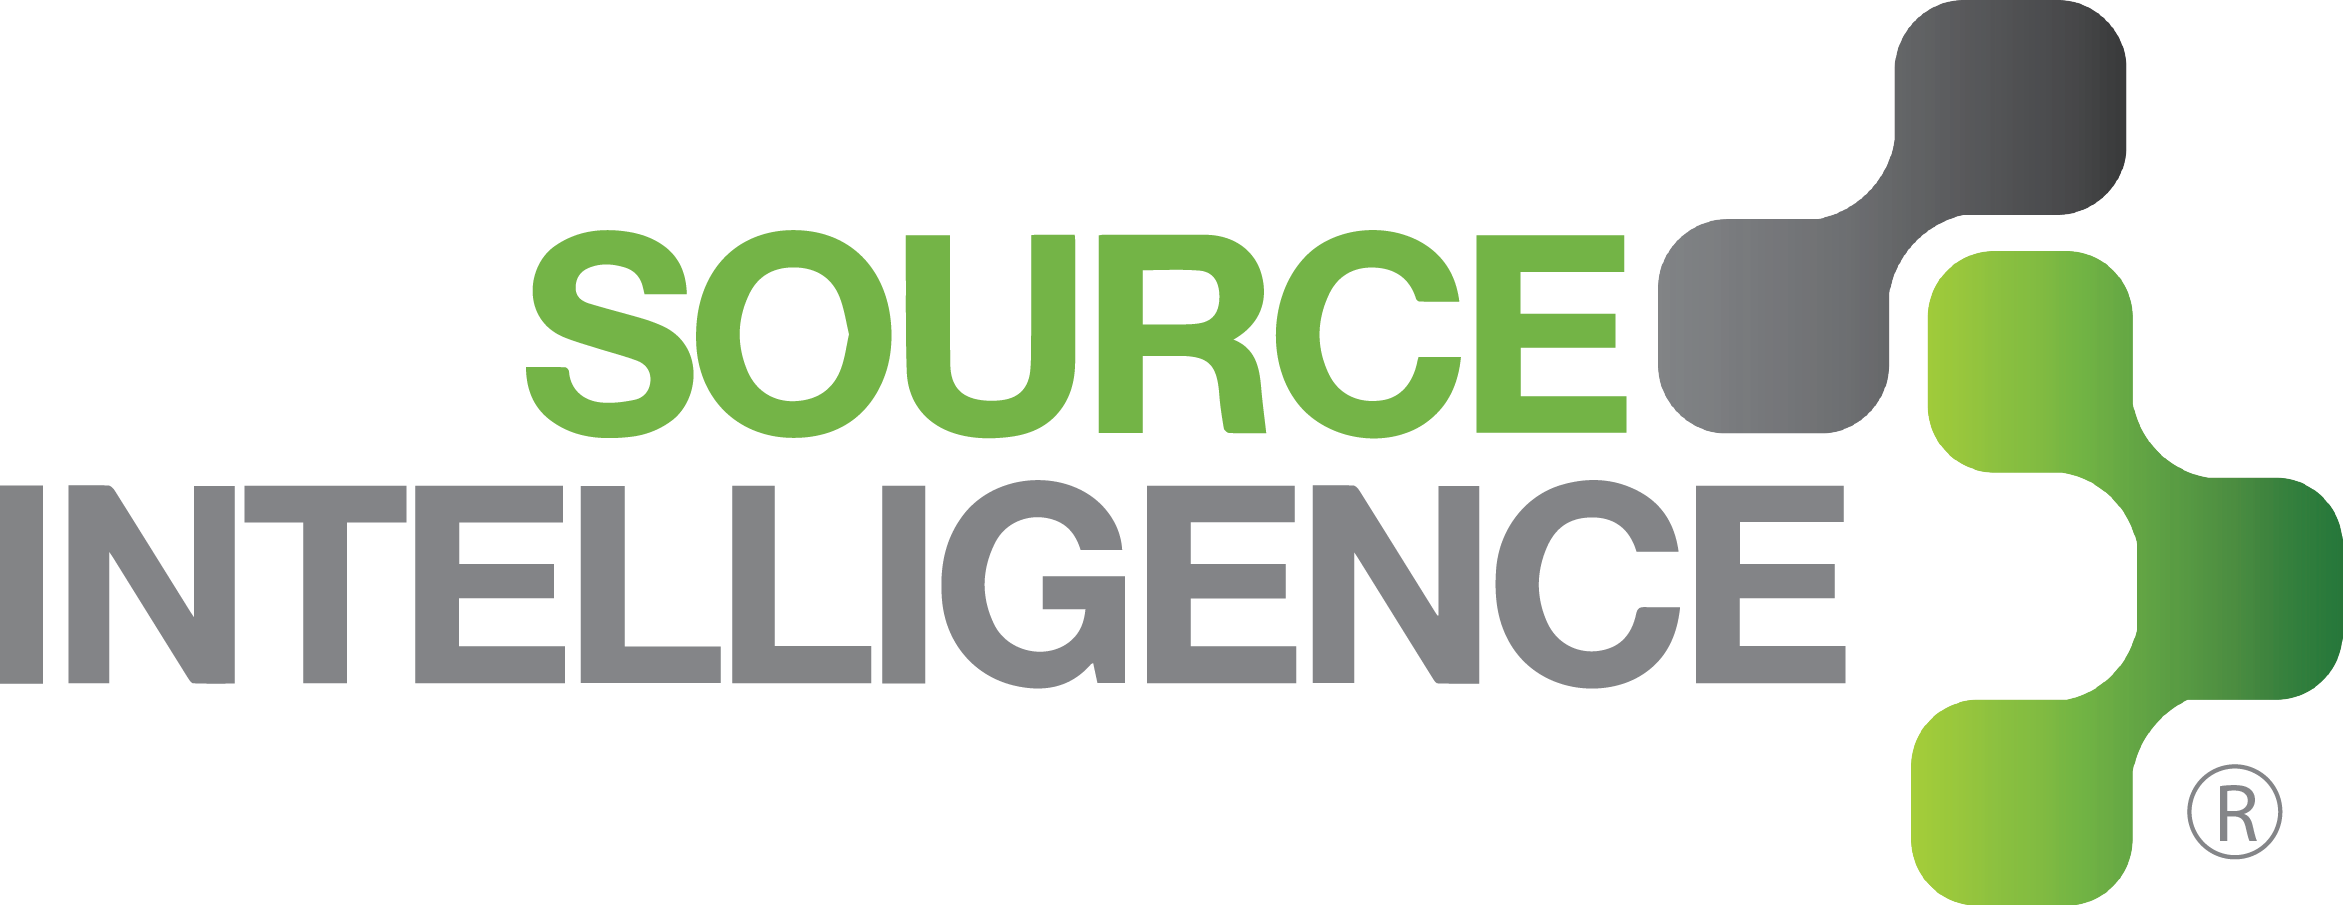 source intelligence